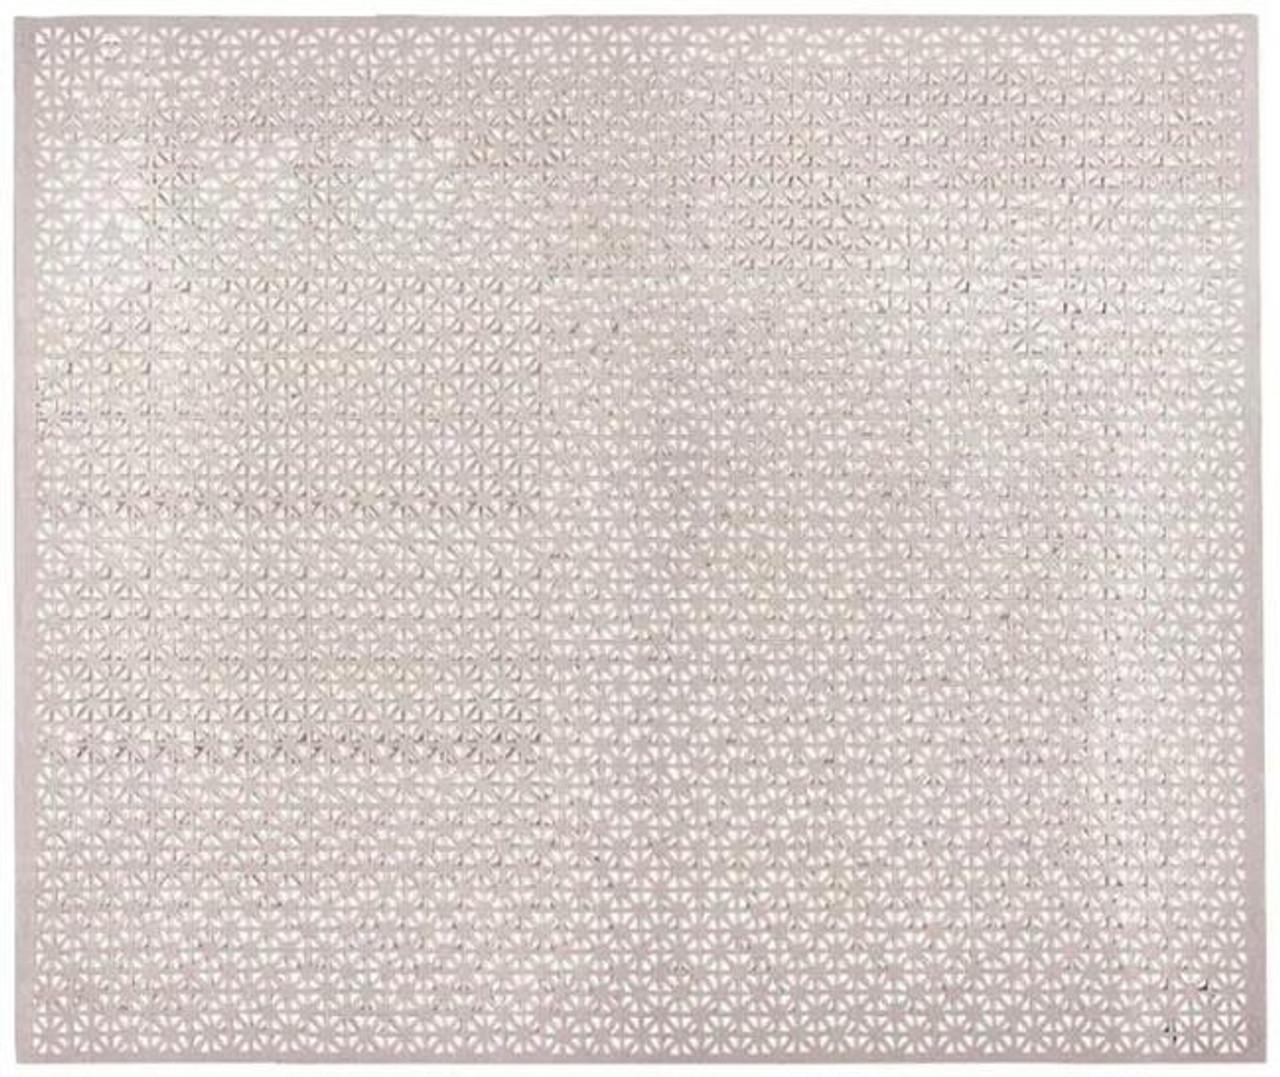 36 x 36 UnionJack Design Aluminum Sheet